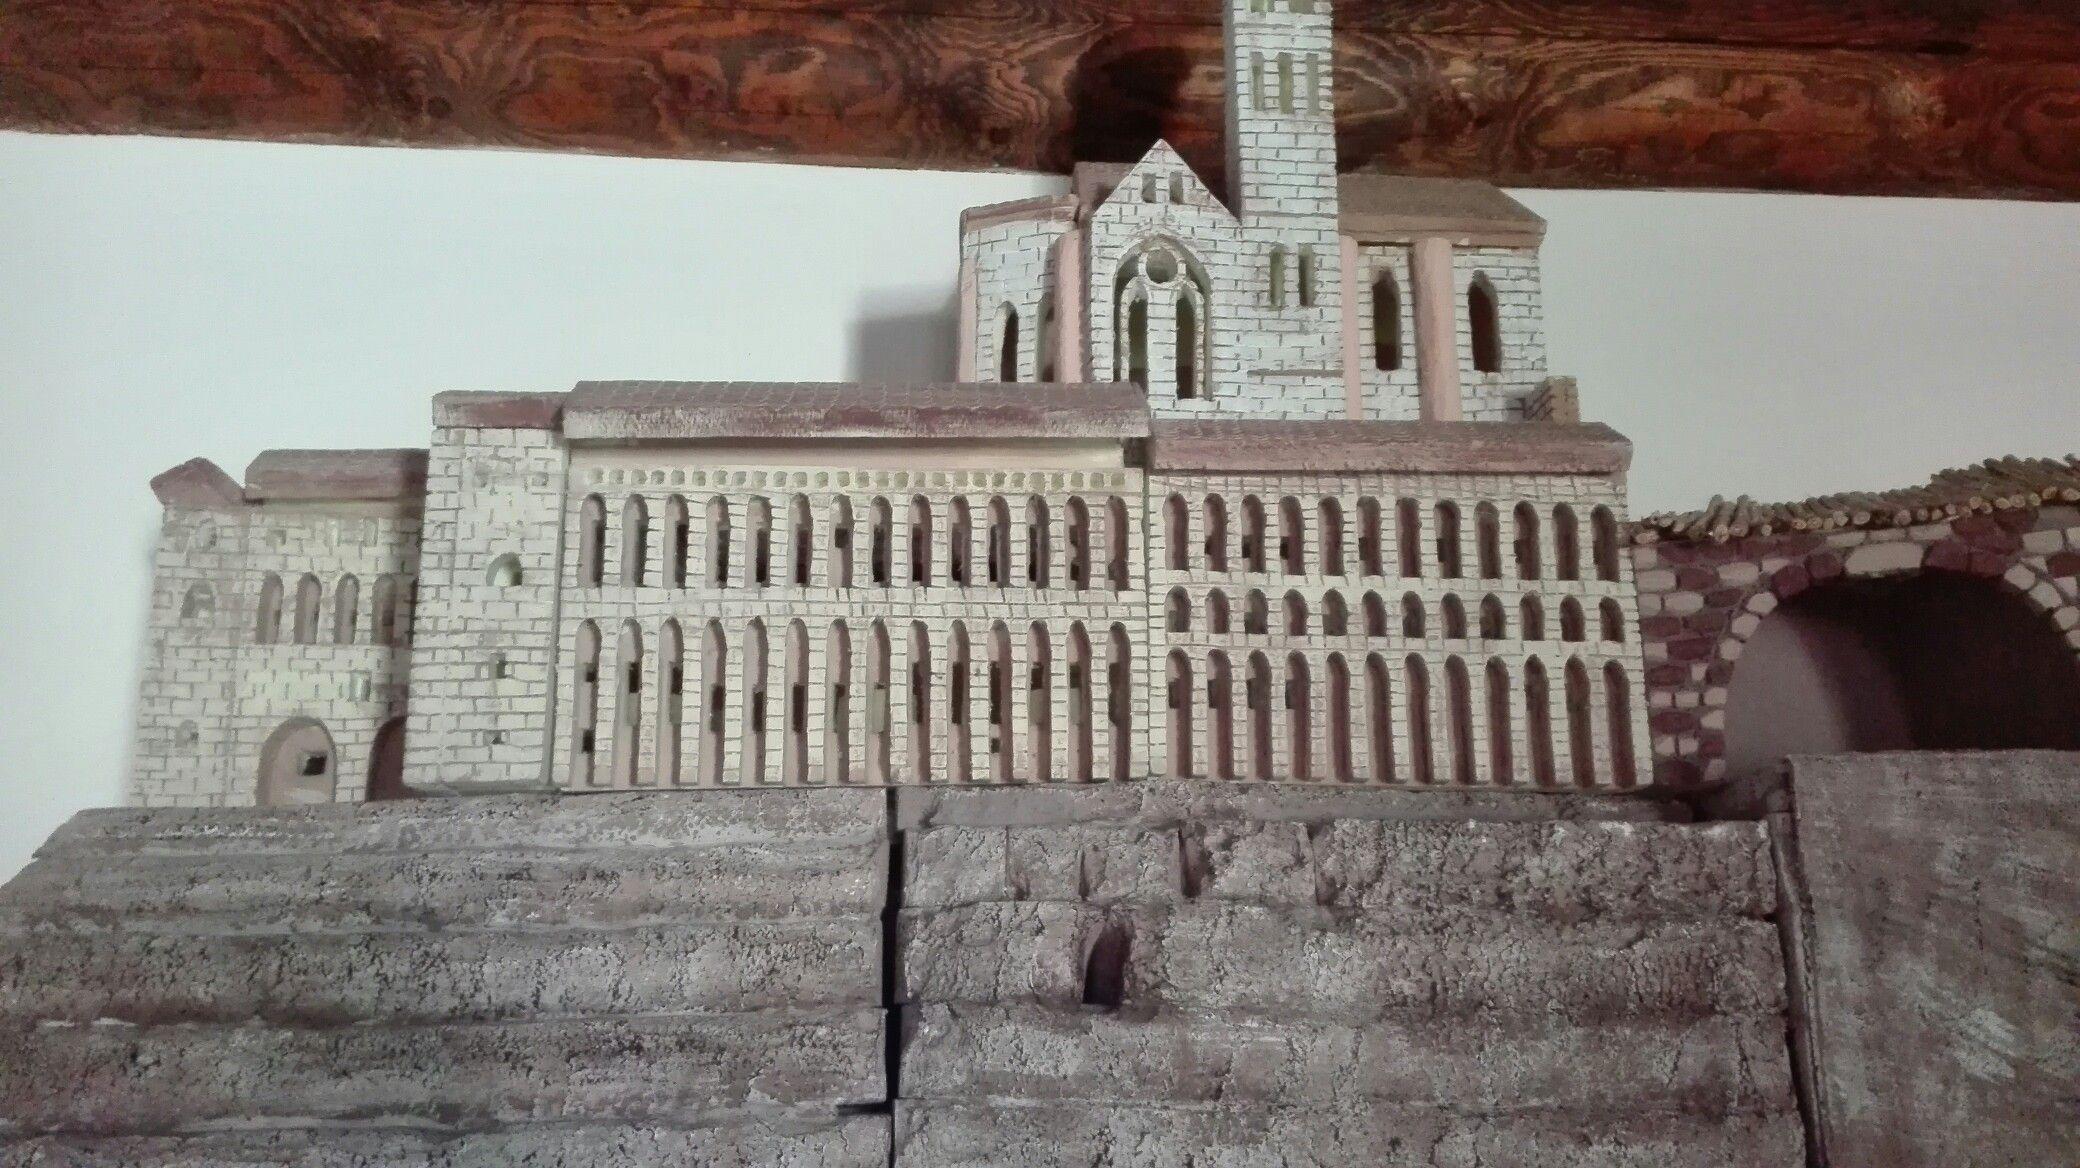 Presepe Francescano riproducente Basilica superiore Assisi in polistirolo